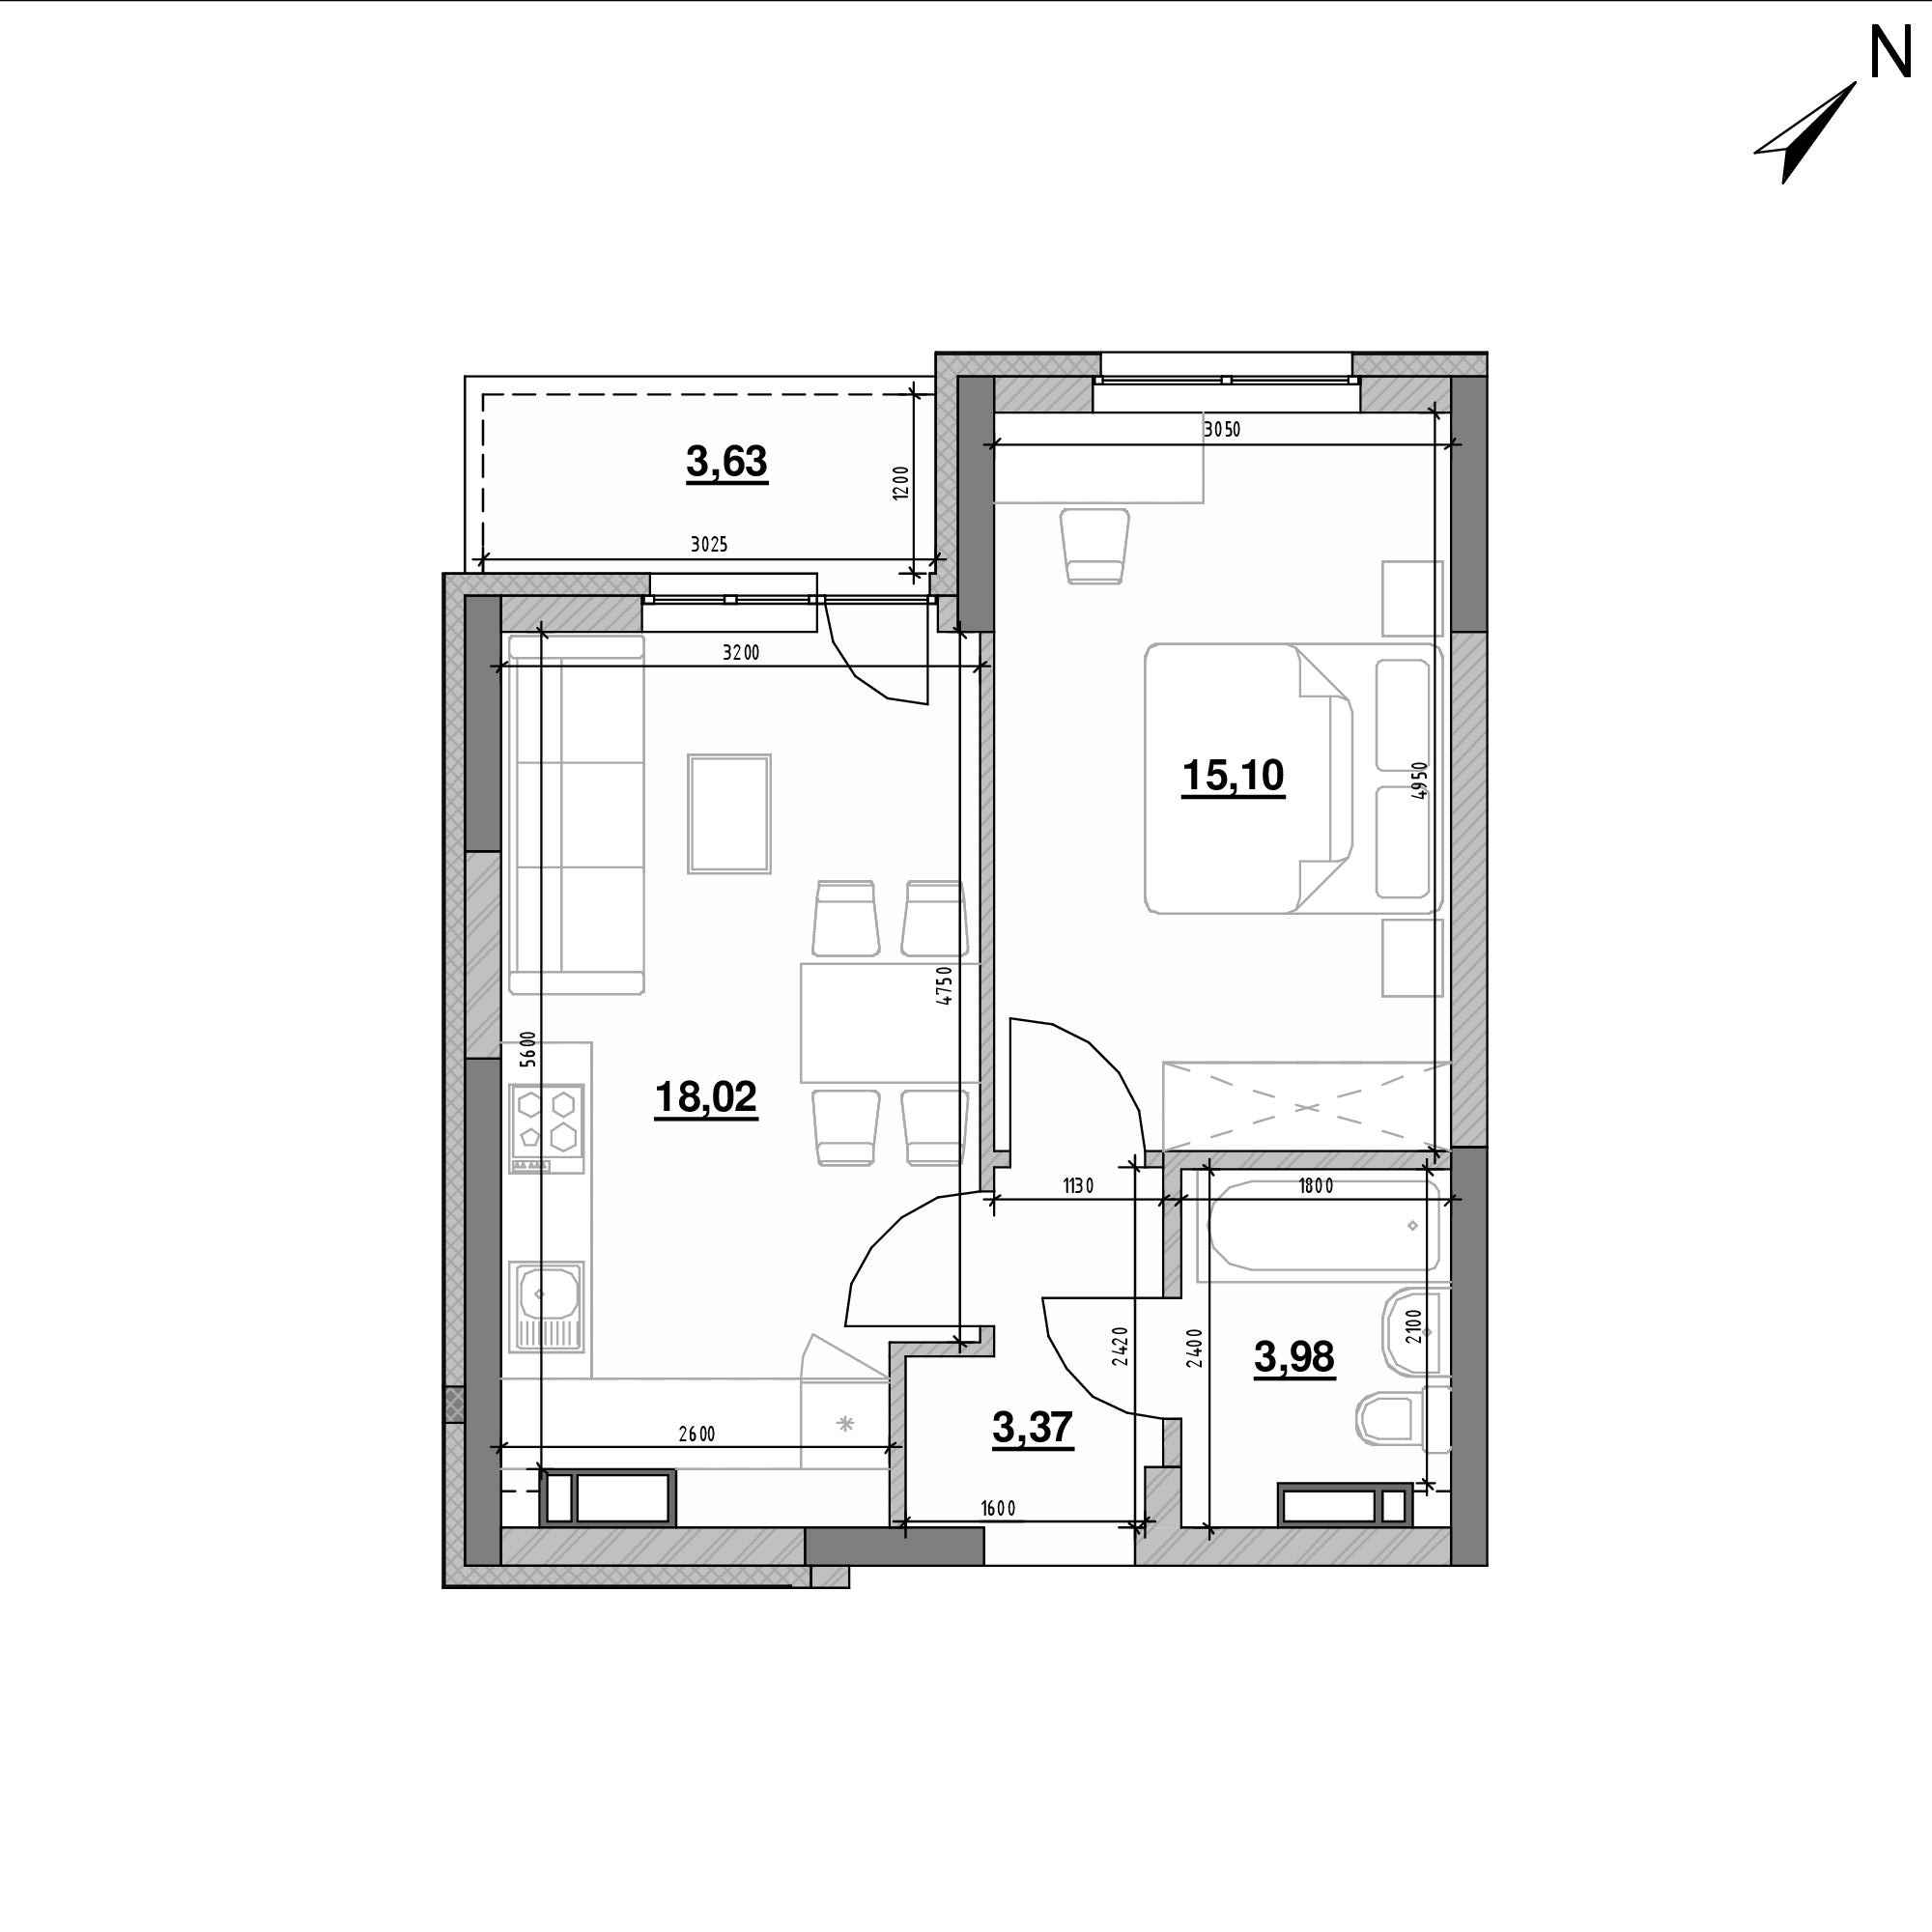 ЖК Оk'Land: планування 1-кімнатної квартири, №464, 44.1 м<sup>2</sup>